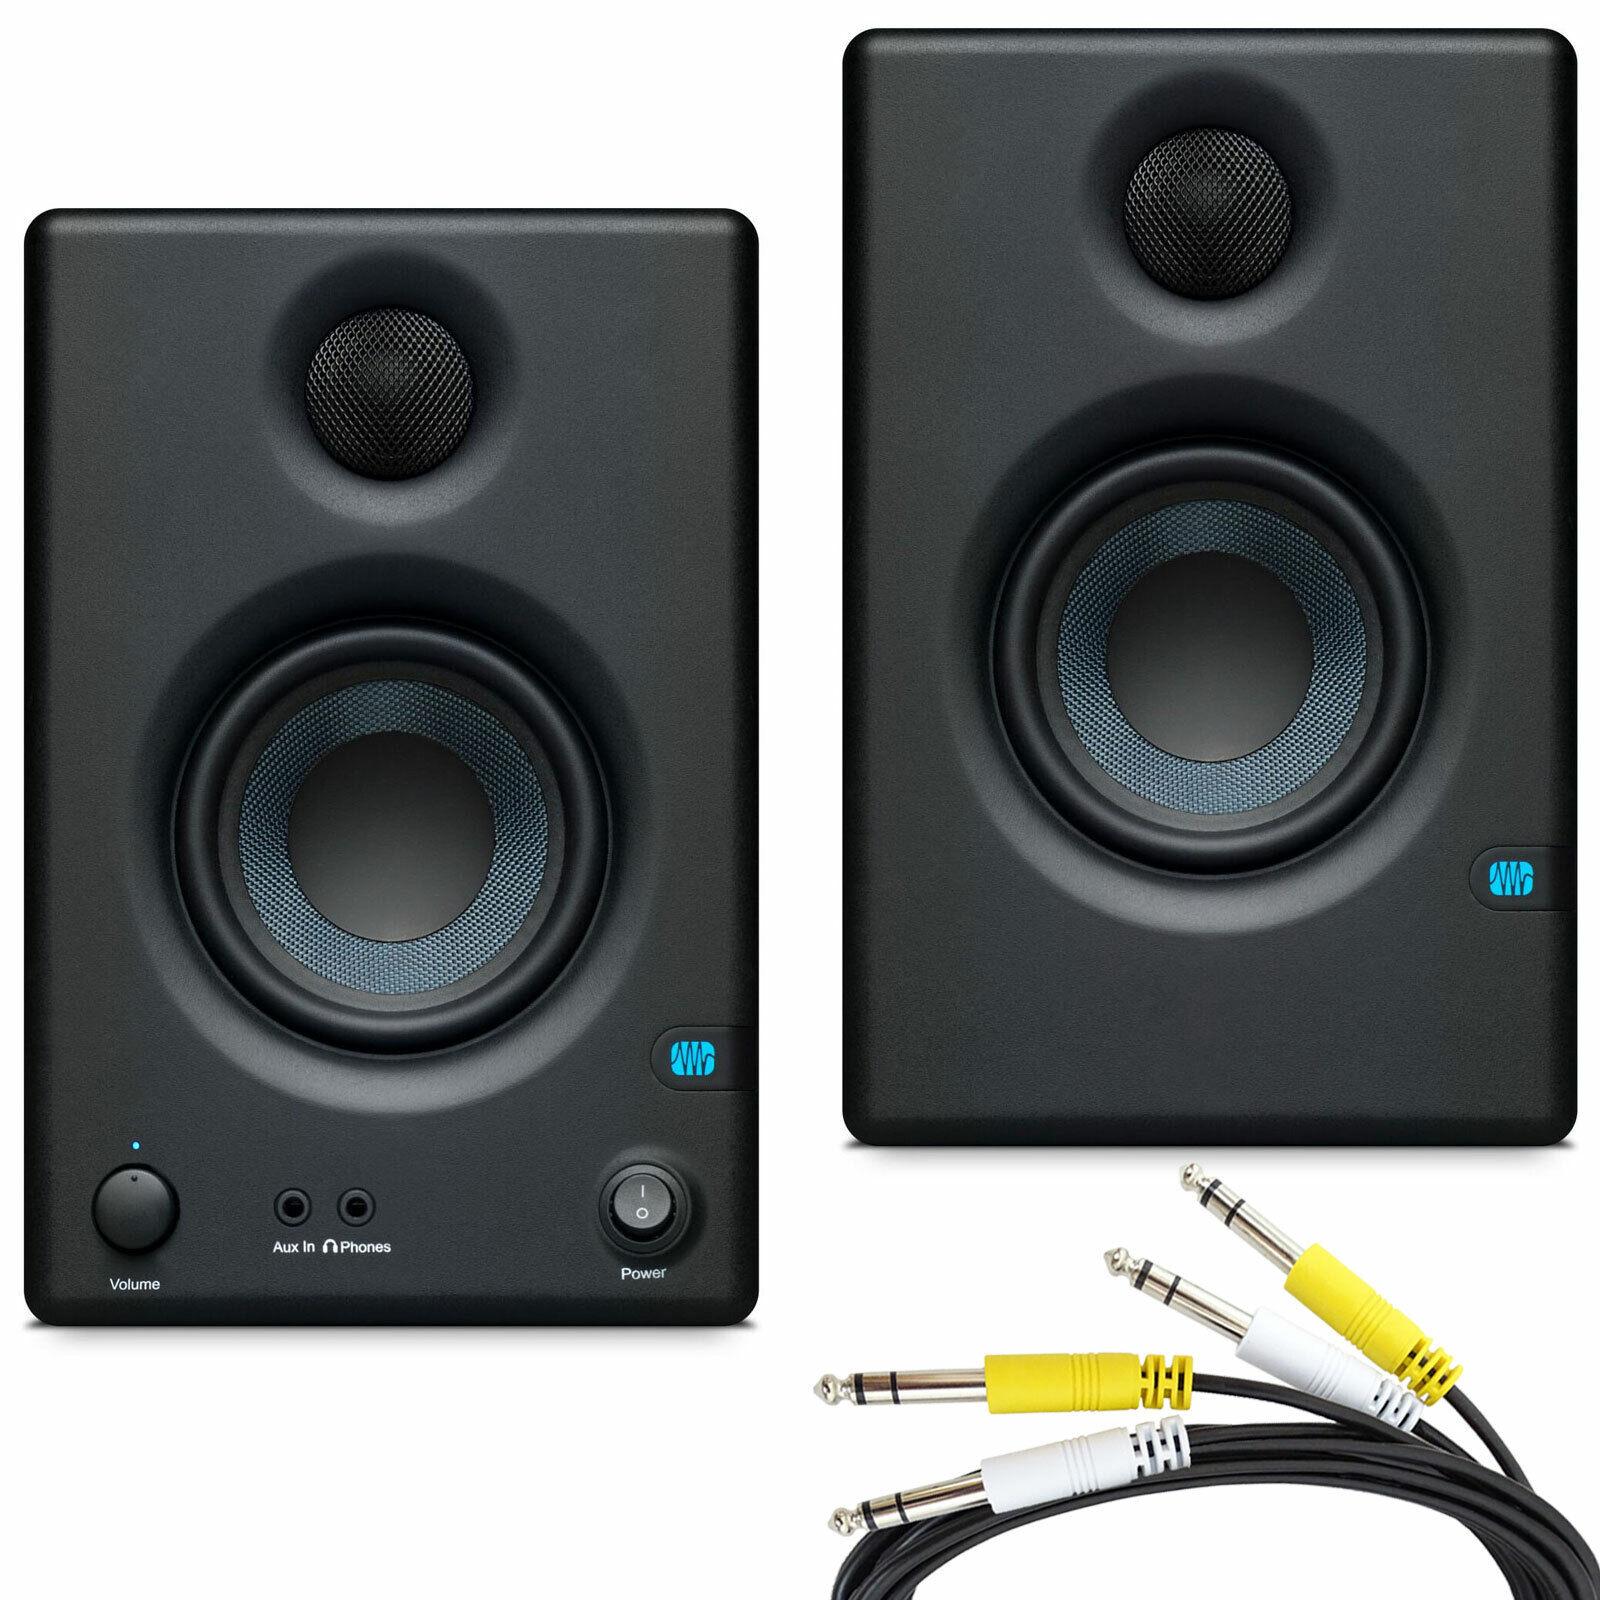 Presonus Eris 3.5 Aktive Multimedia Monitor-Boxen + 2-fach Klinke Anschlusskabel